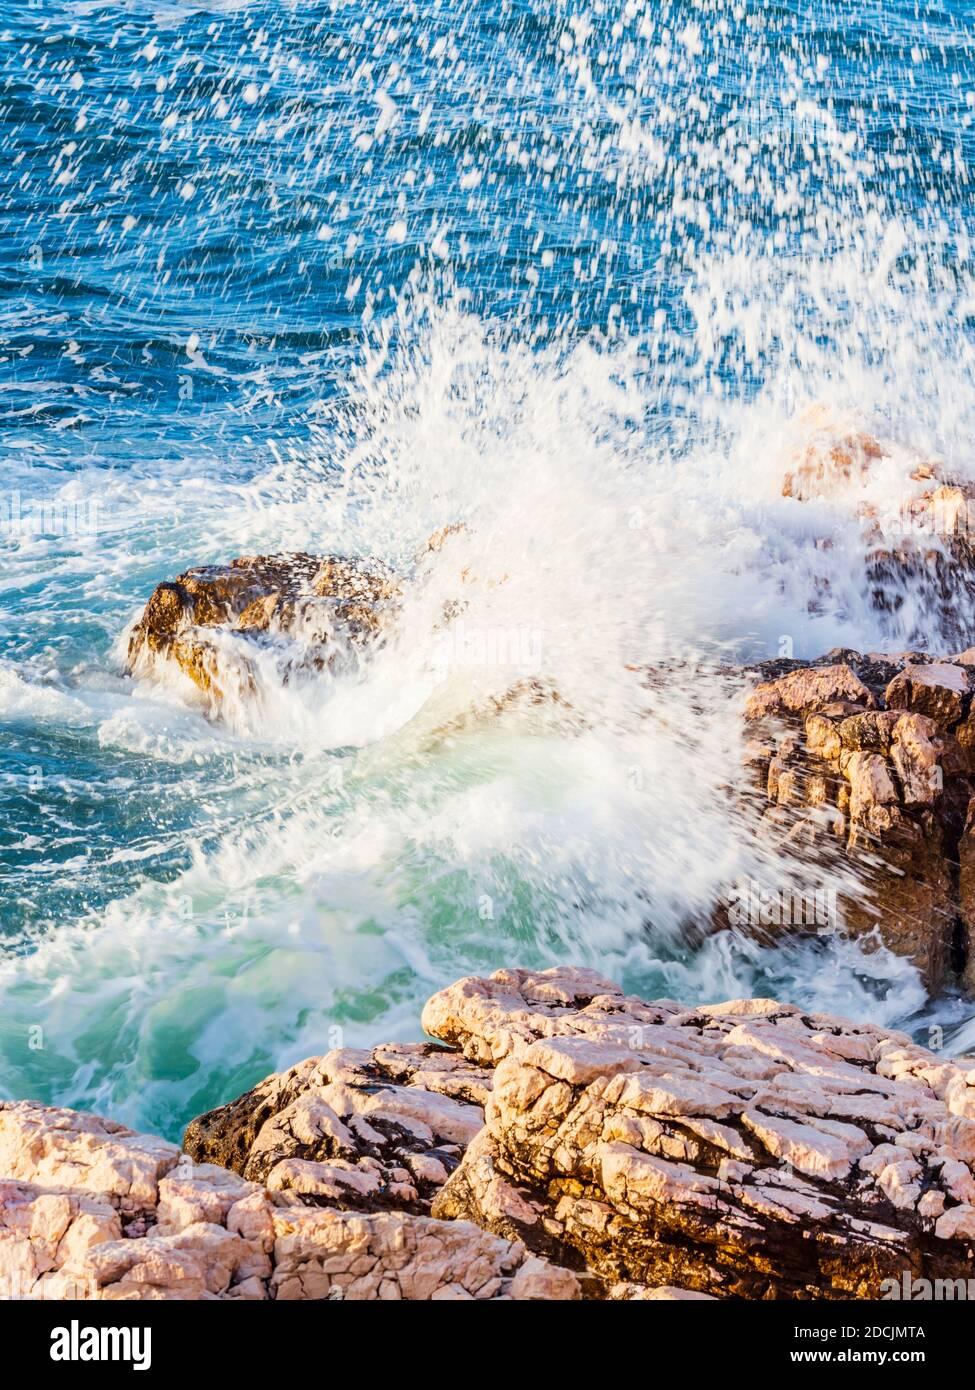 Severe windy stormy storm high sea waves Novi Vinodolski in Croatia Stock Photo